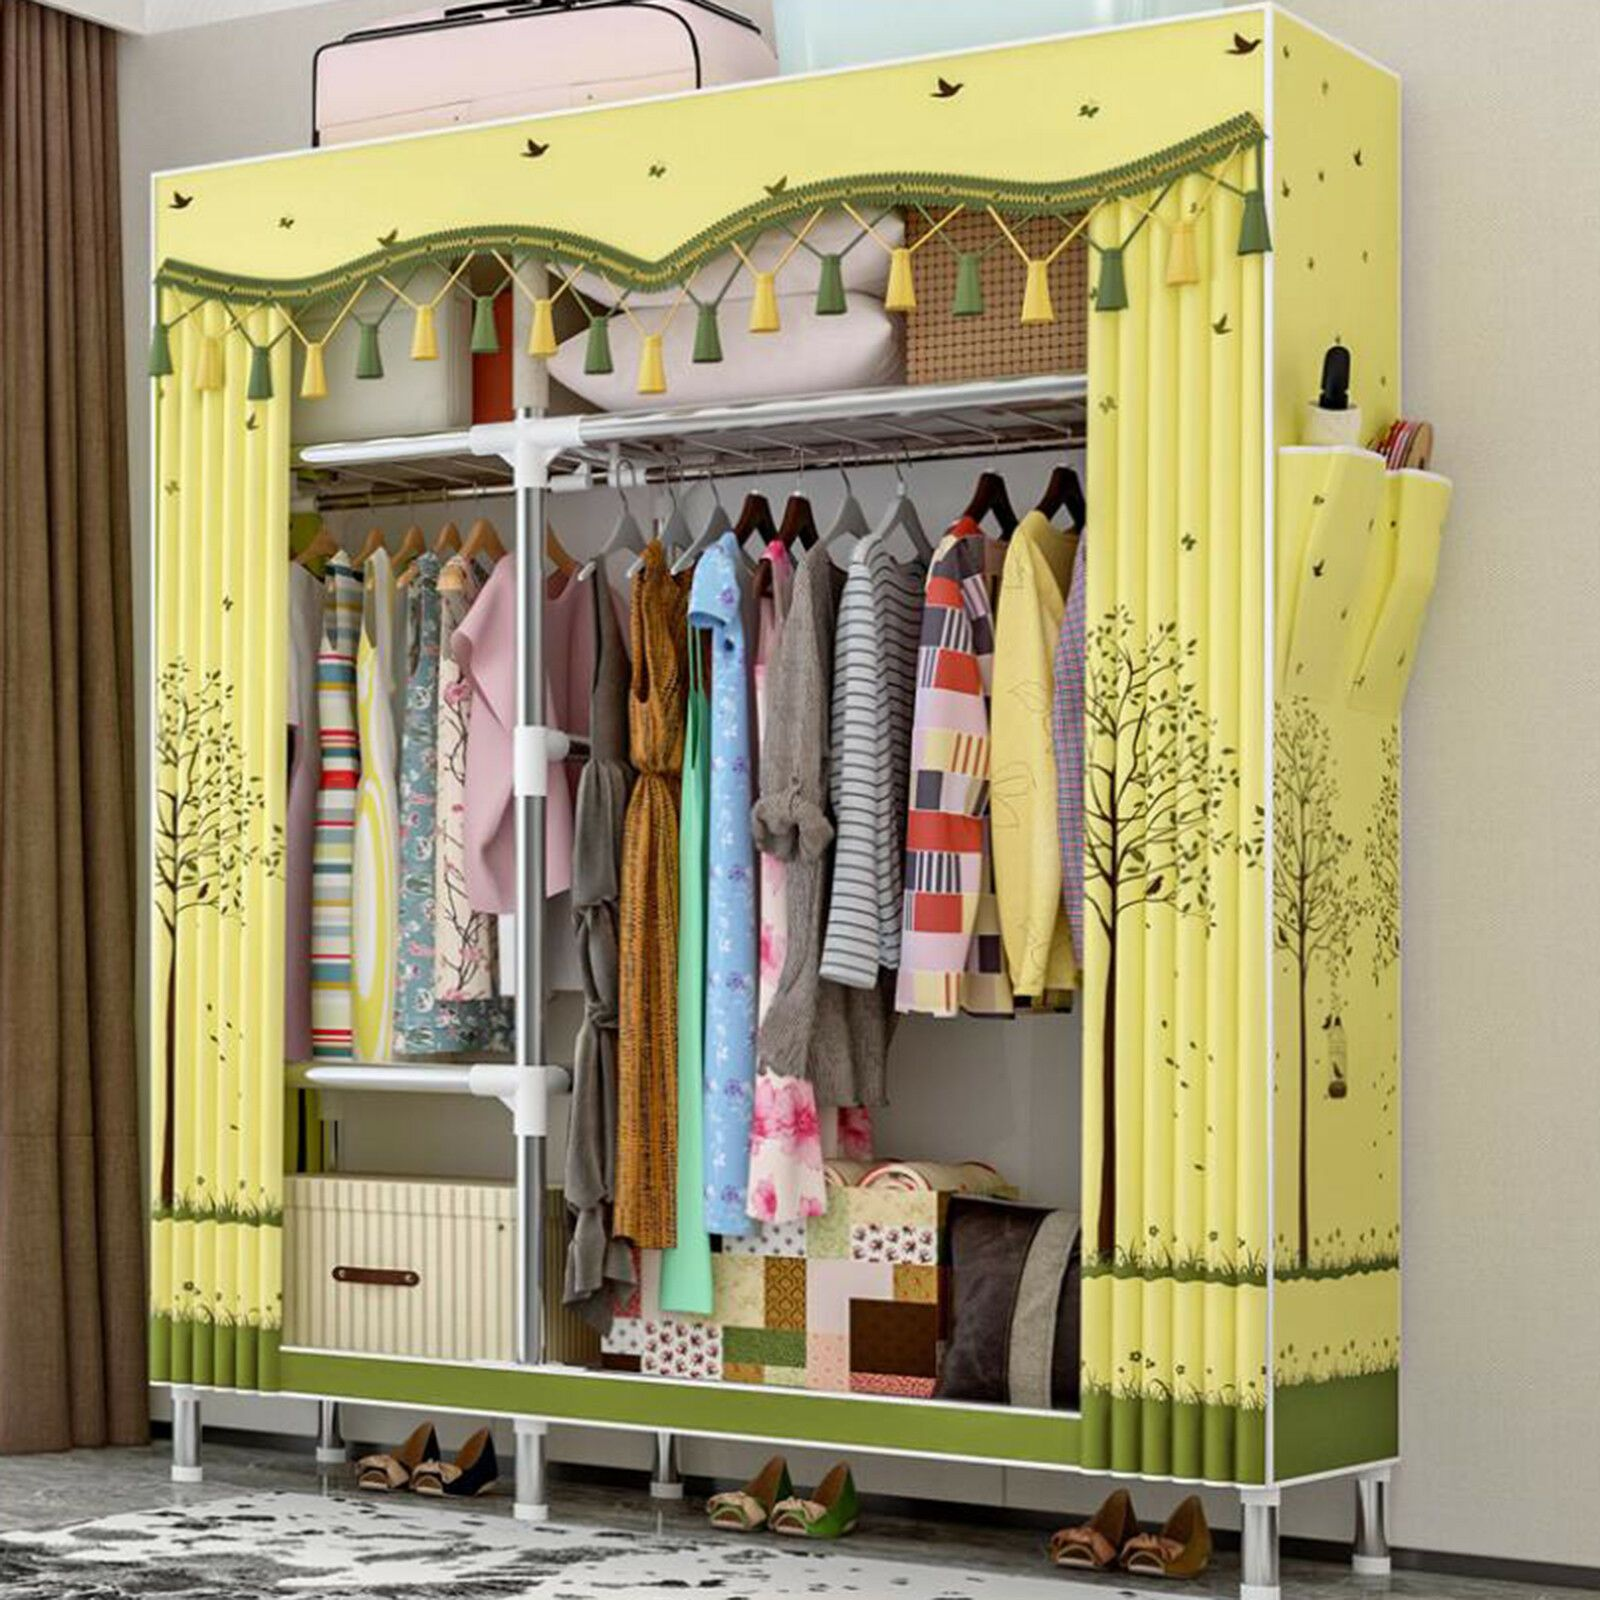 68 Heavy Duty Closet Storage Organizer Wardrobe Clothes Rack